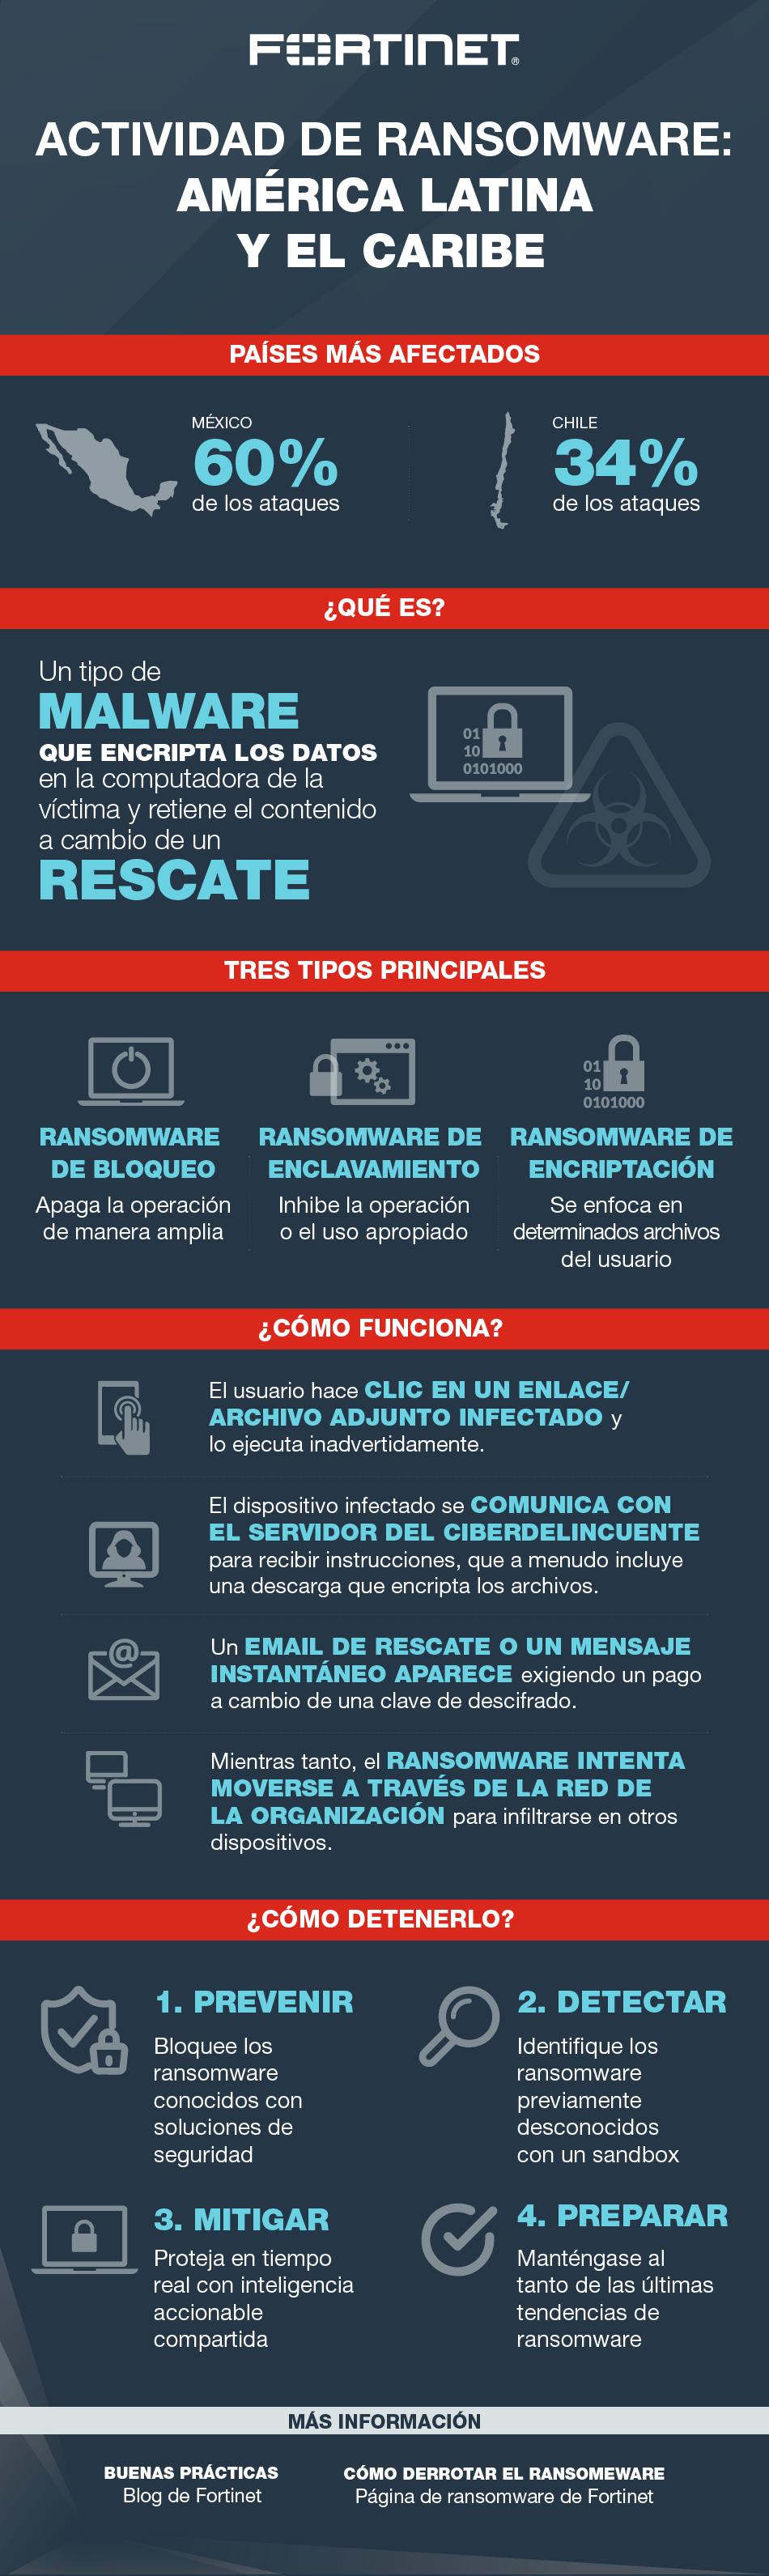 Fortinet Latam Ransomware Infographic_ESP